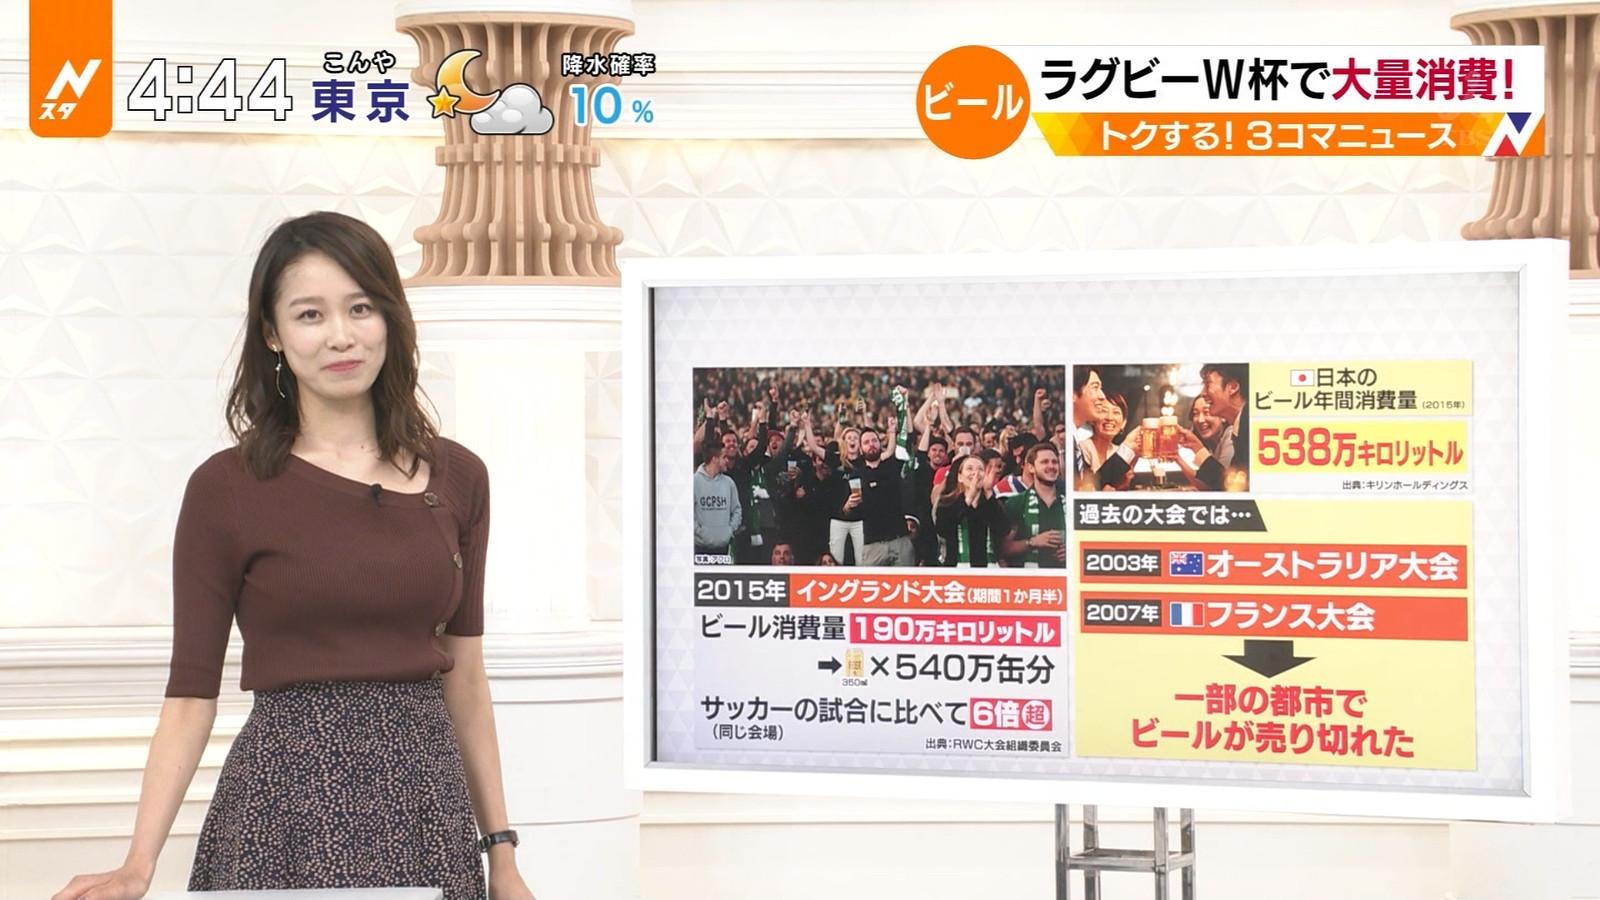 TBS女子アナ・良原安美さんのテレビキャプチャー画像-001